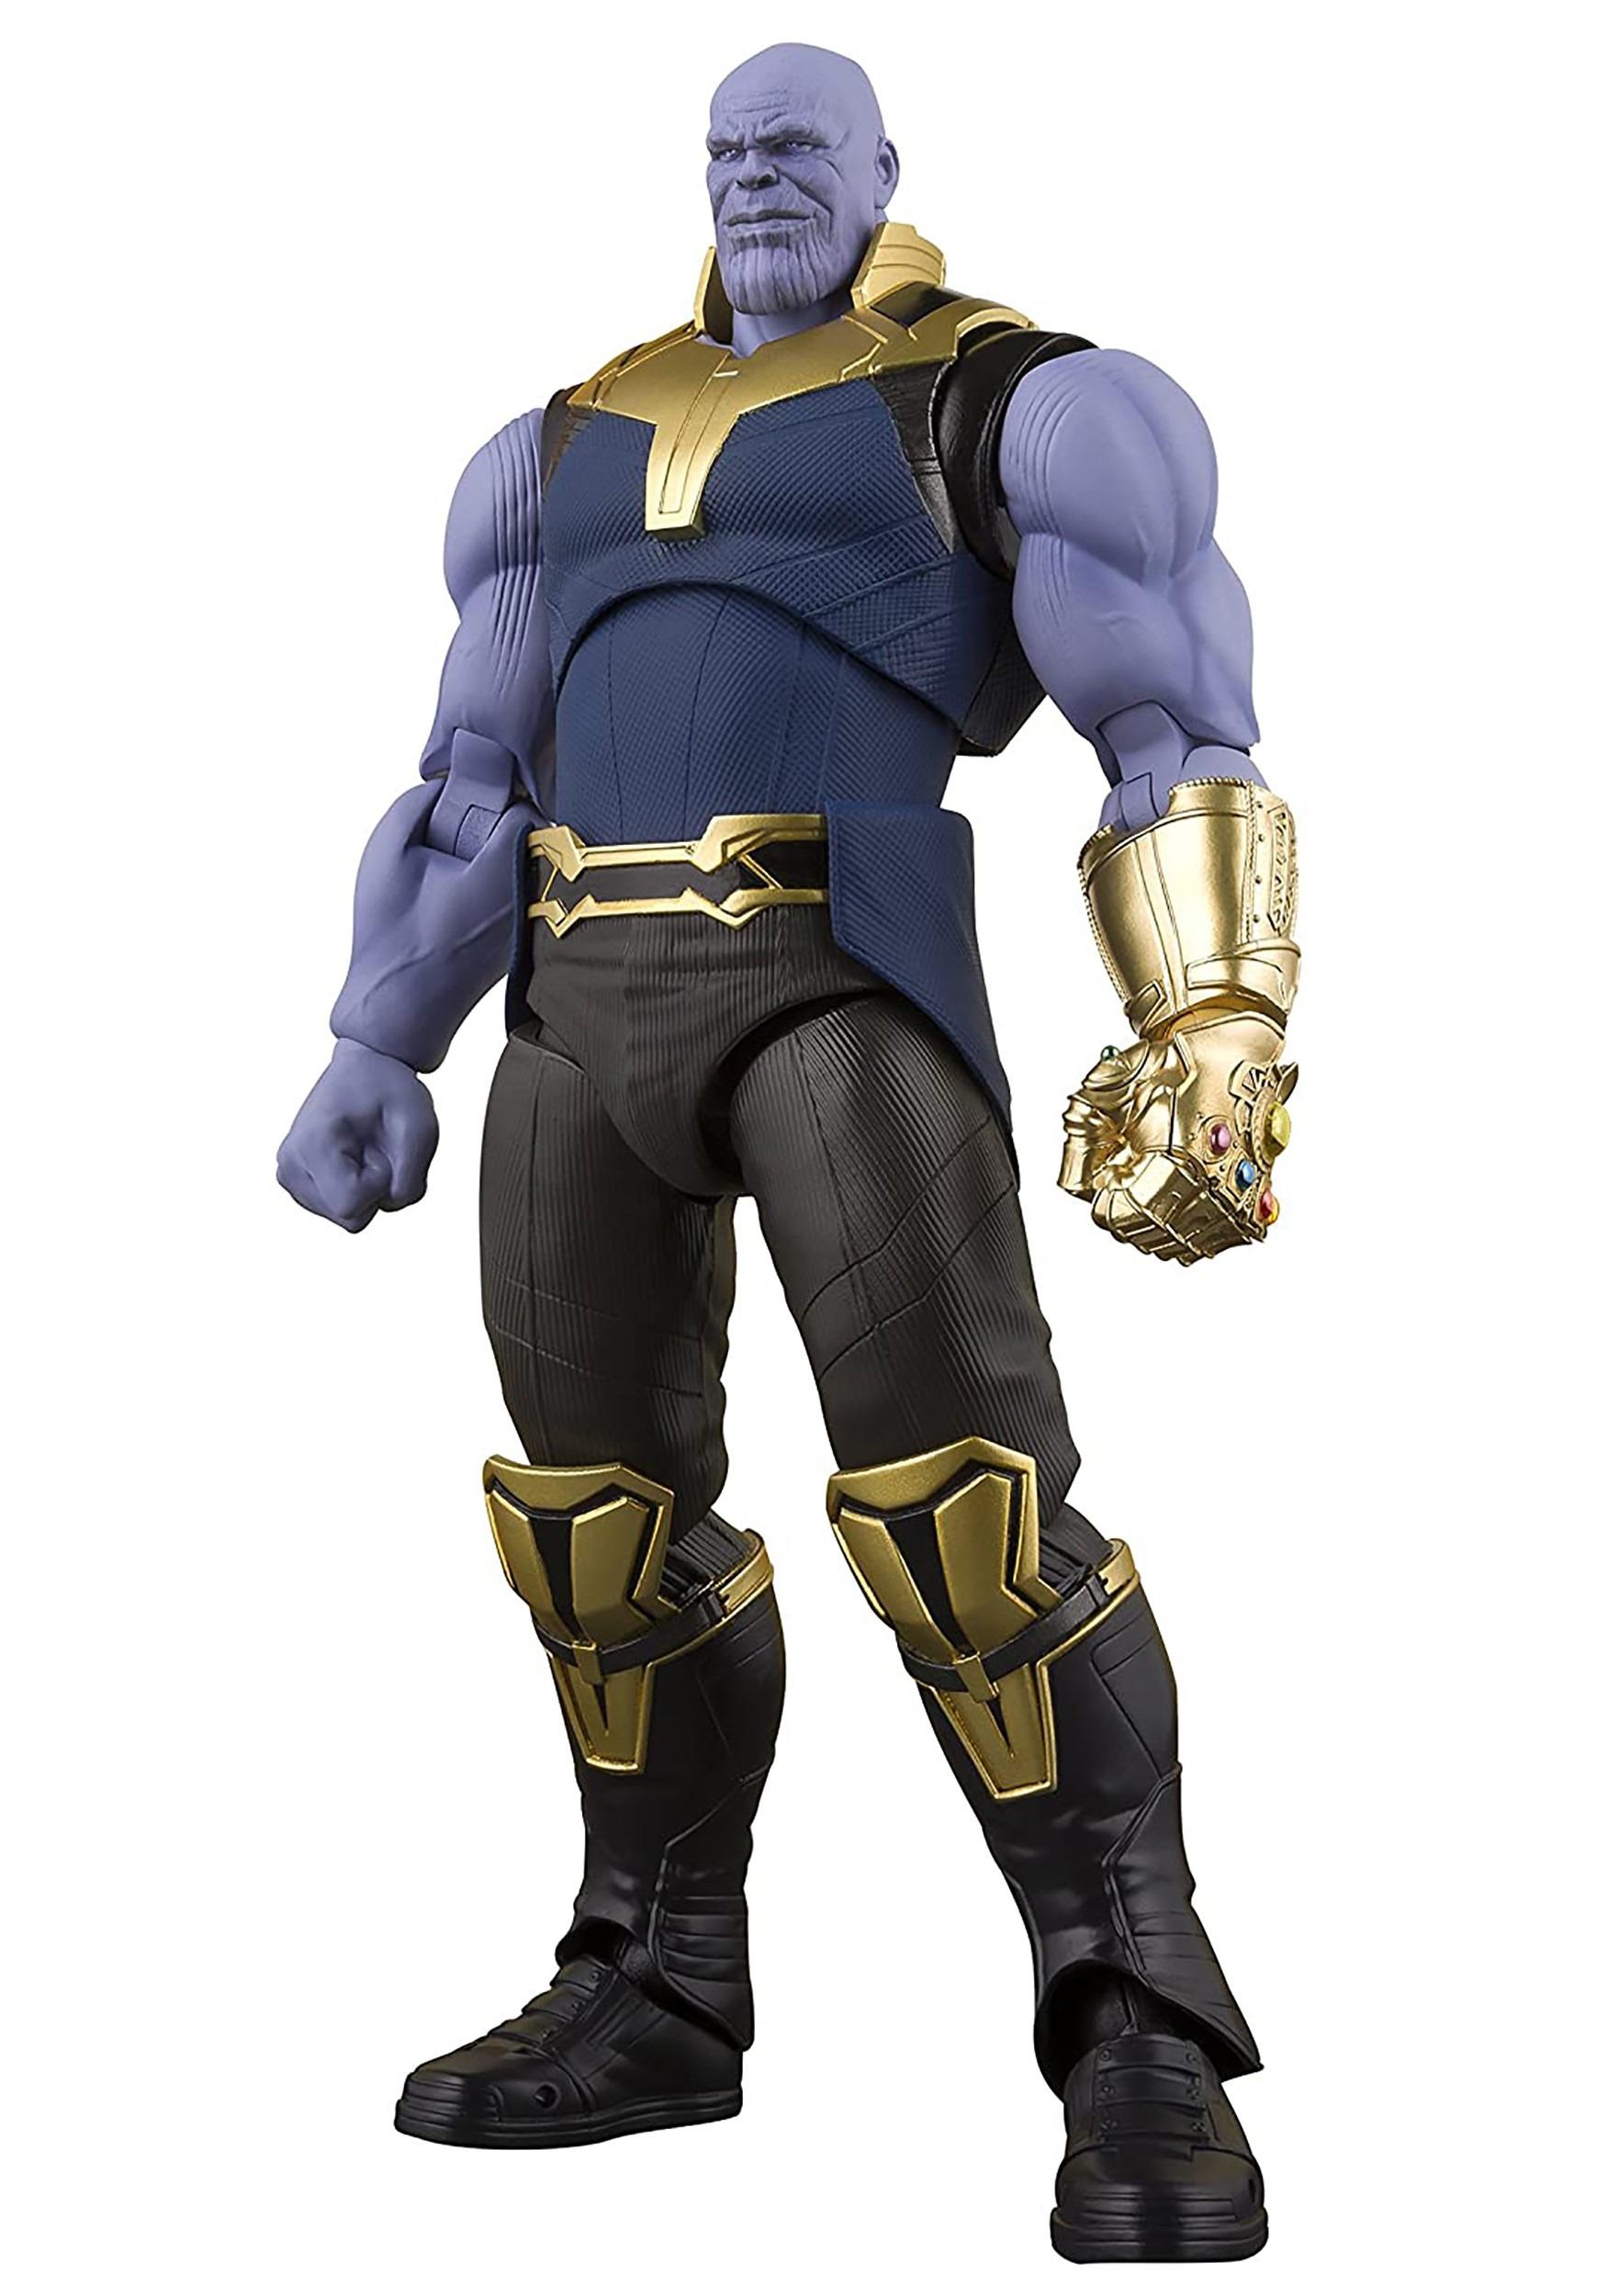 Thanos Avengers: Infinity War SH Figuarts Action Figure